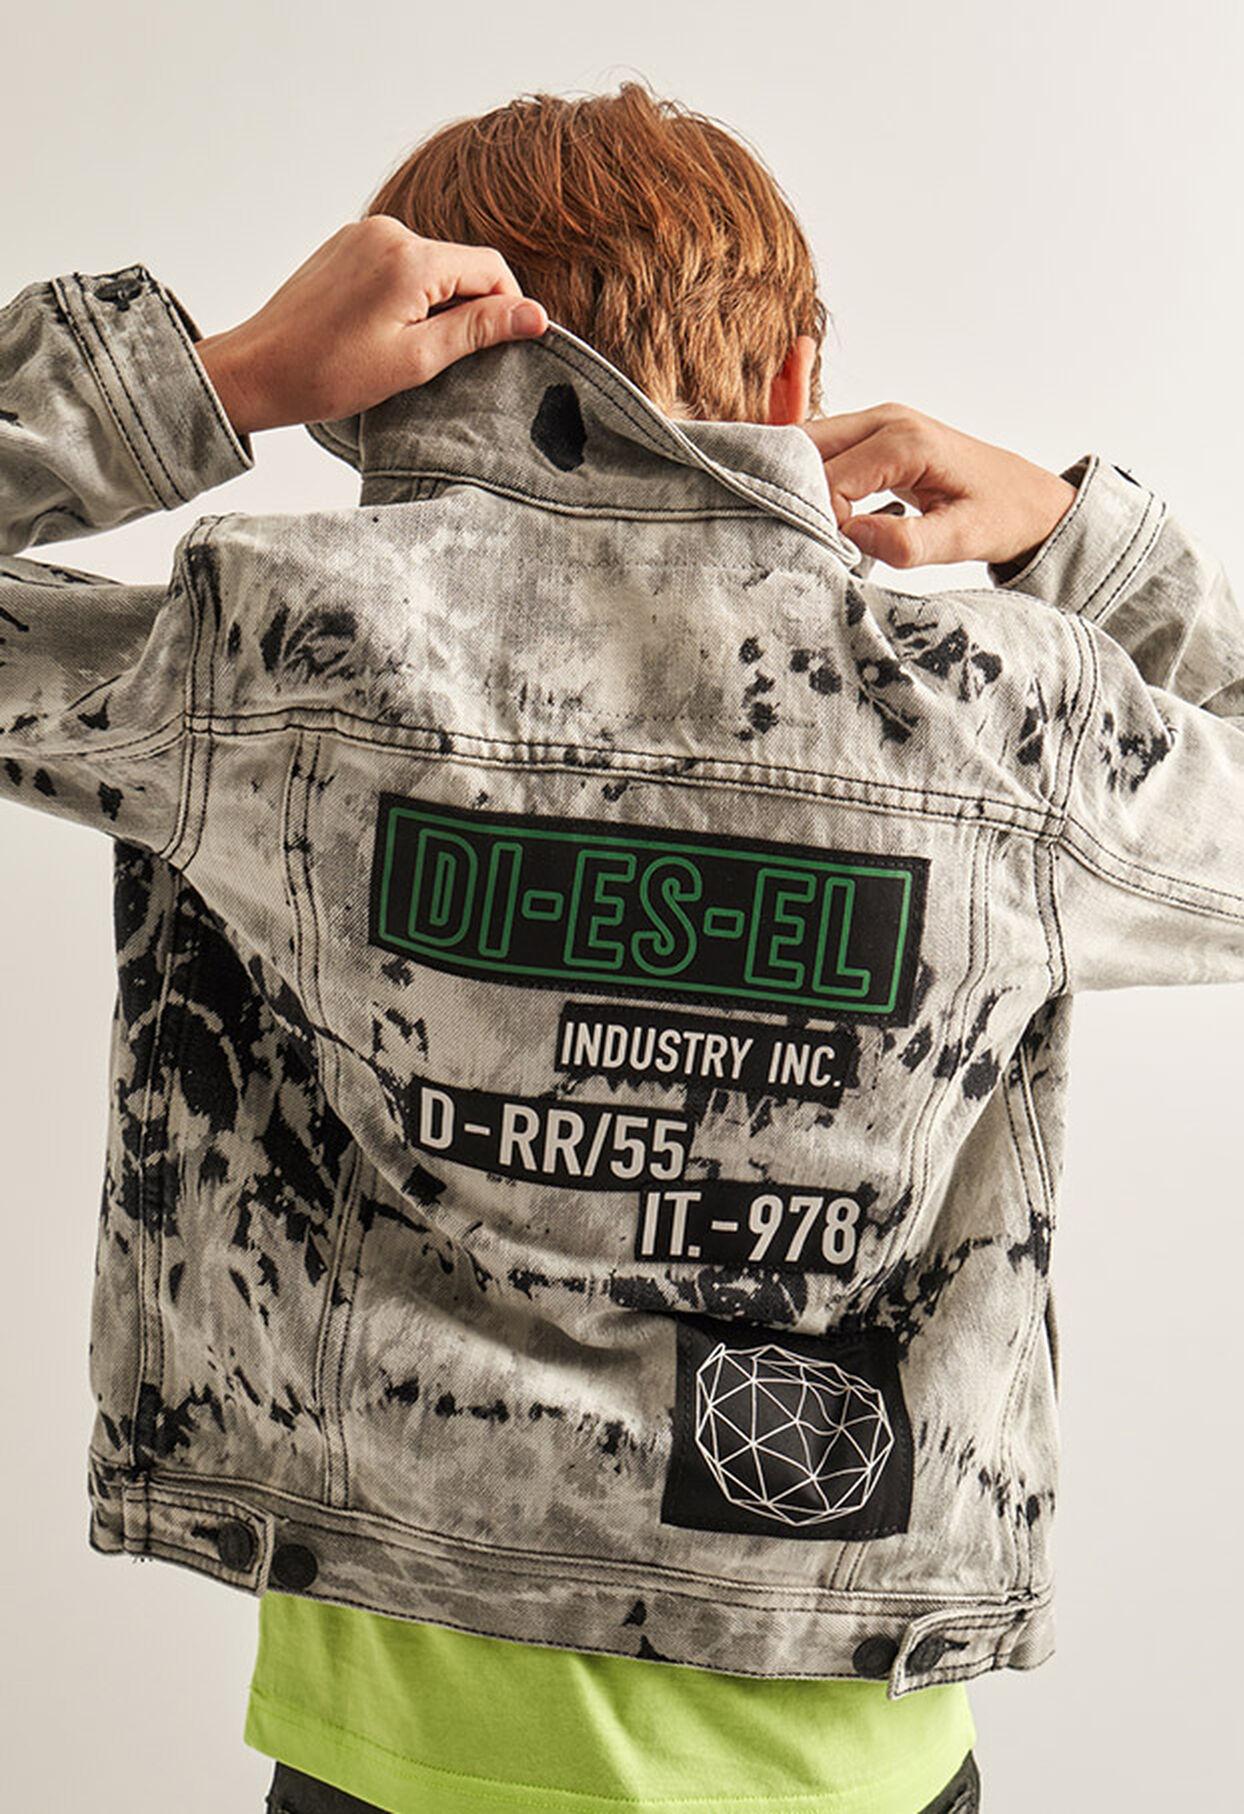 https://lu.diesel.com/dw/image/v2/BBLG_PRD/on/demandware.static/-/Library-Sites-DieselMFSharedLibrary/default/dw9fd09078/CATEGORYOV/2x2_90.jpg?sw=1244&sh=1814